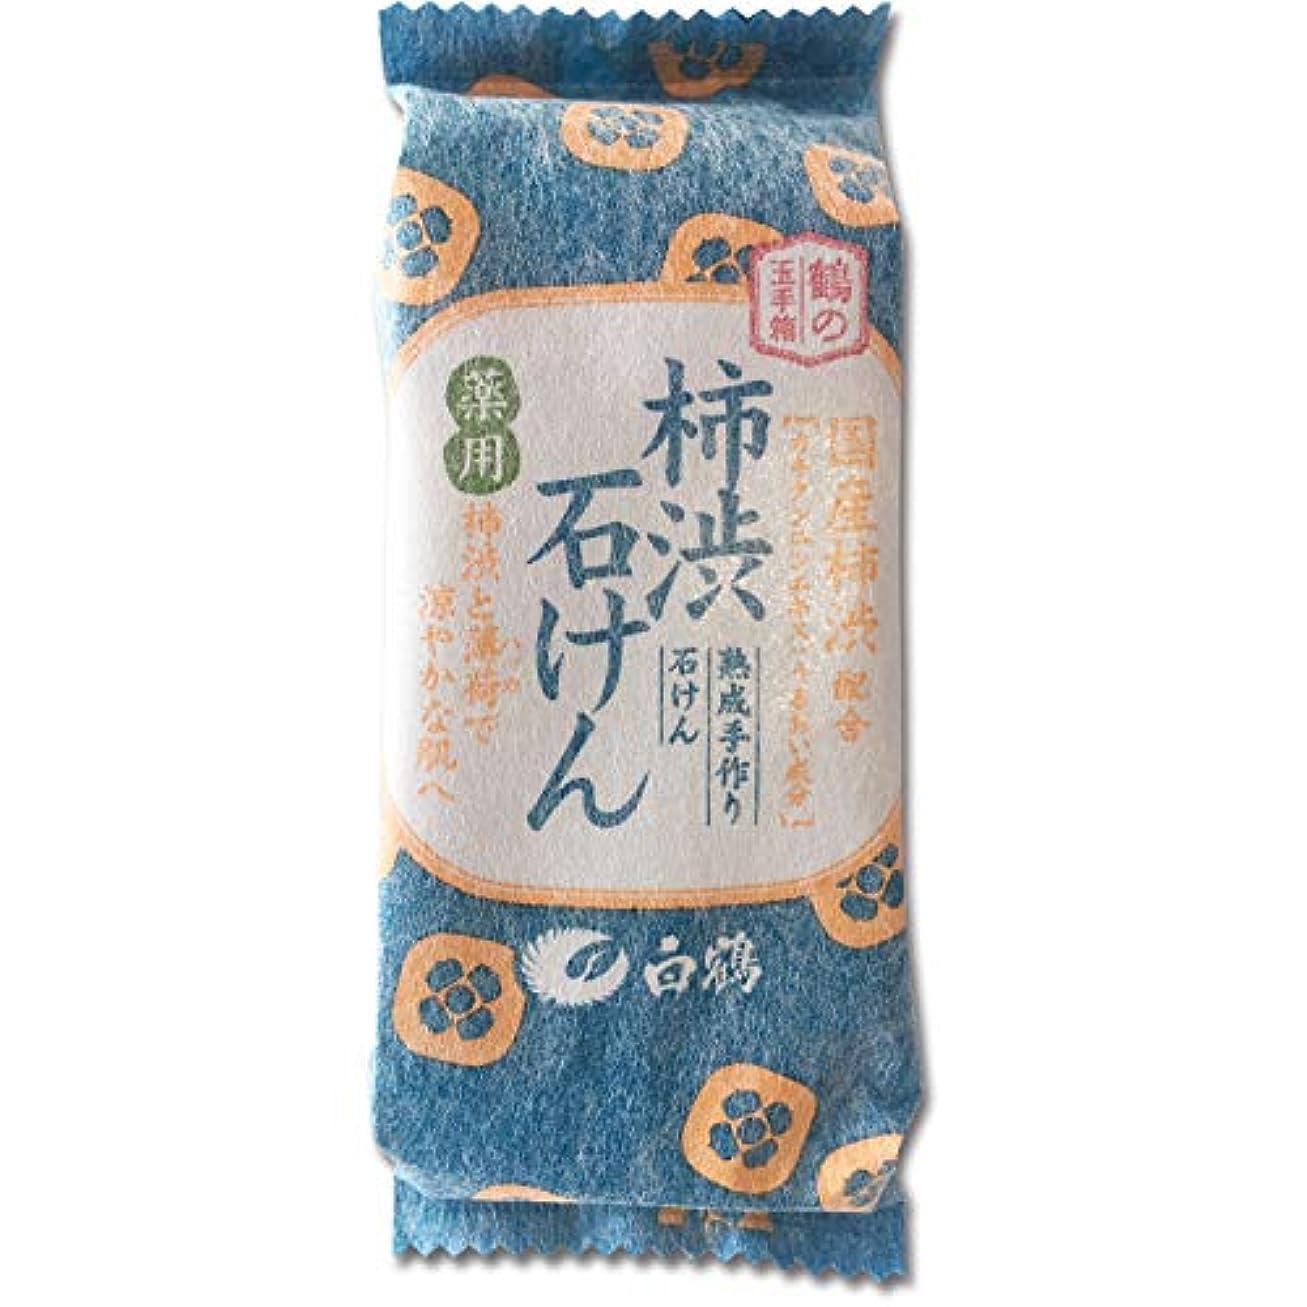 原始的な本歴史的白鶴 鶴の玉手箱 薬用 柿渋石けん 110g (全身用石鹸)